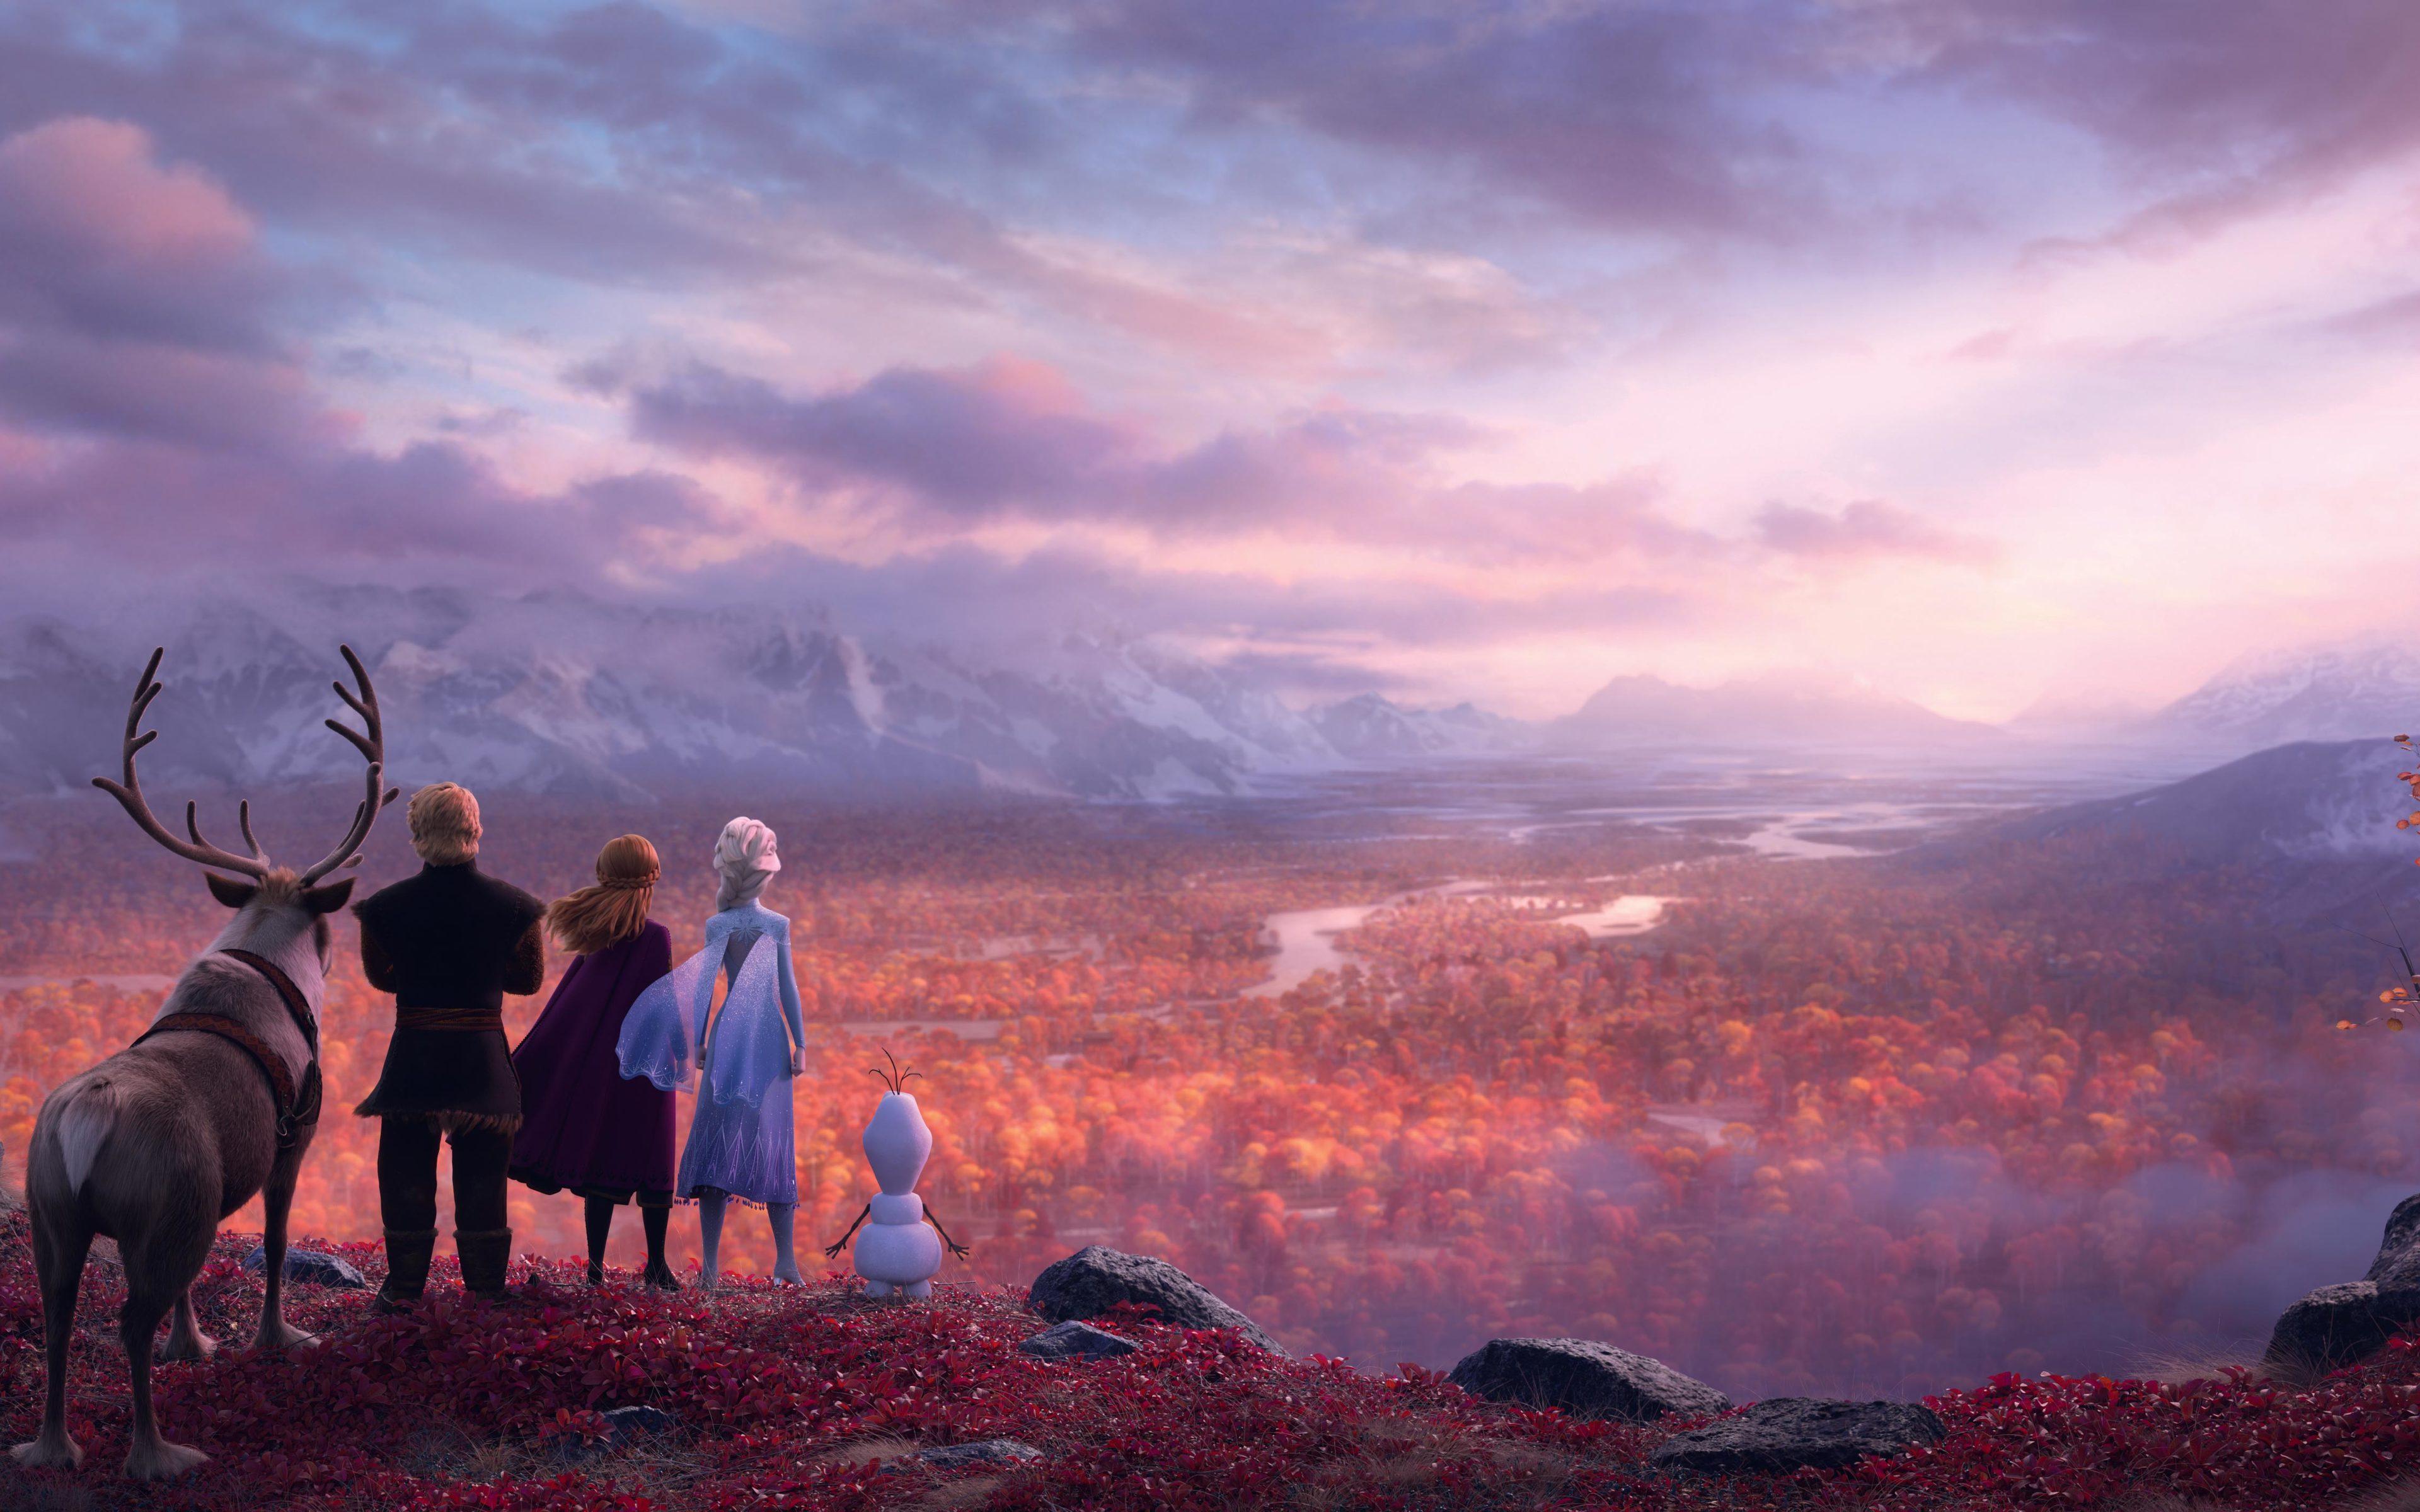 Fondos de pantalla Personajes de Frozen